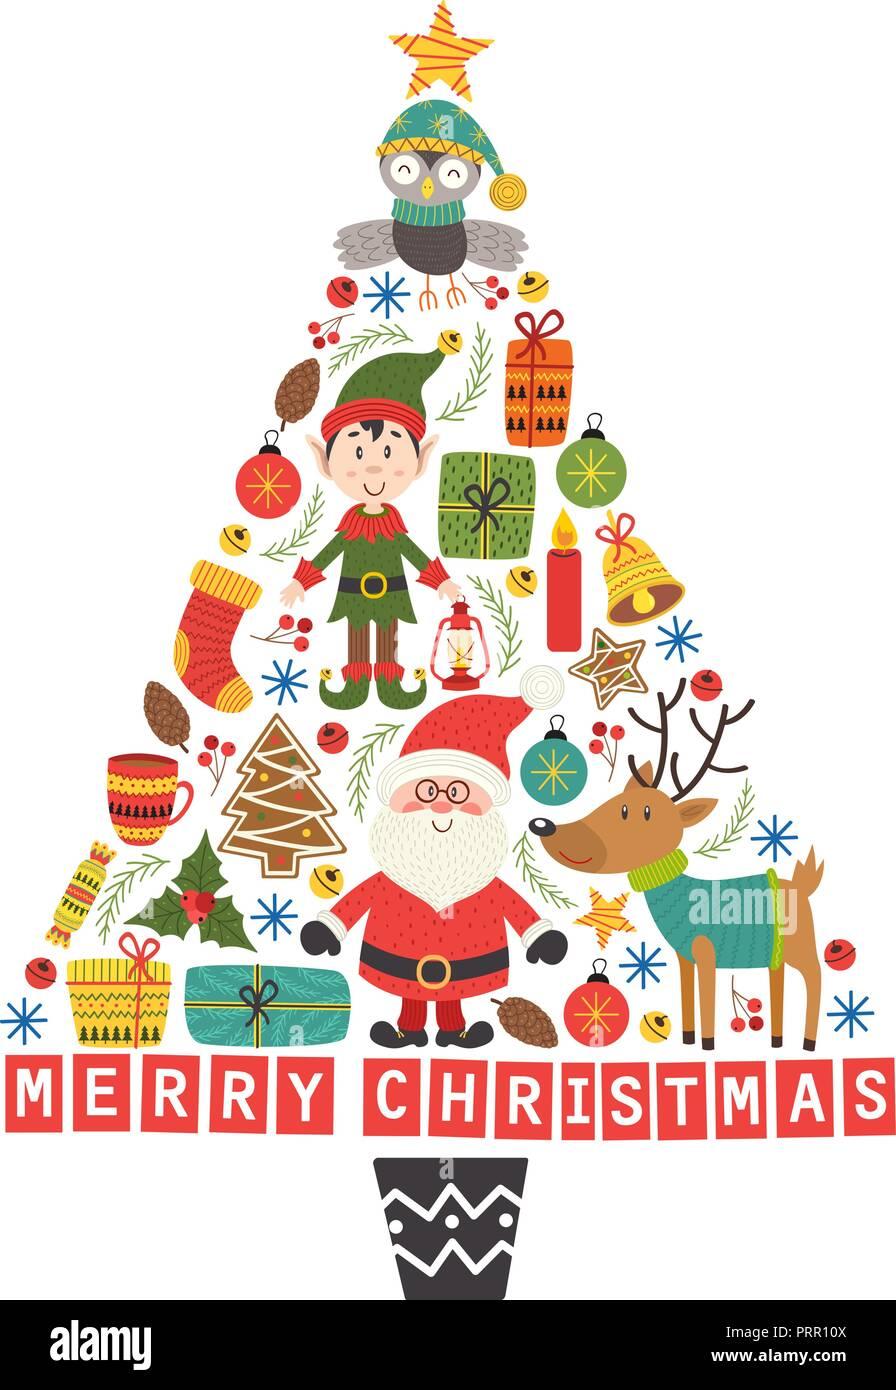 Immagini Natalizie Vettoriali.Vettori Di Natale Decorazioni Vettoriali Immagini Vettori Di